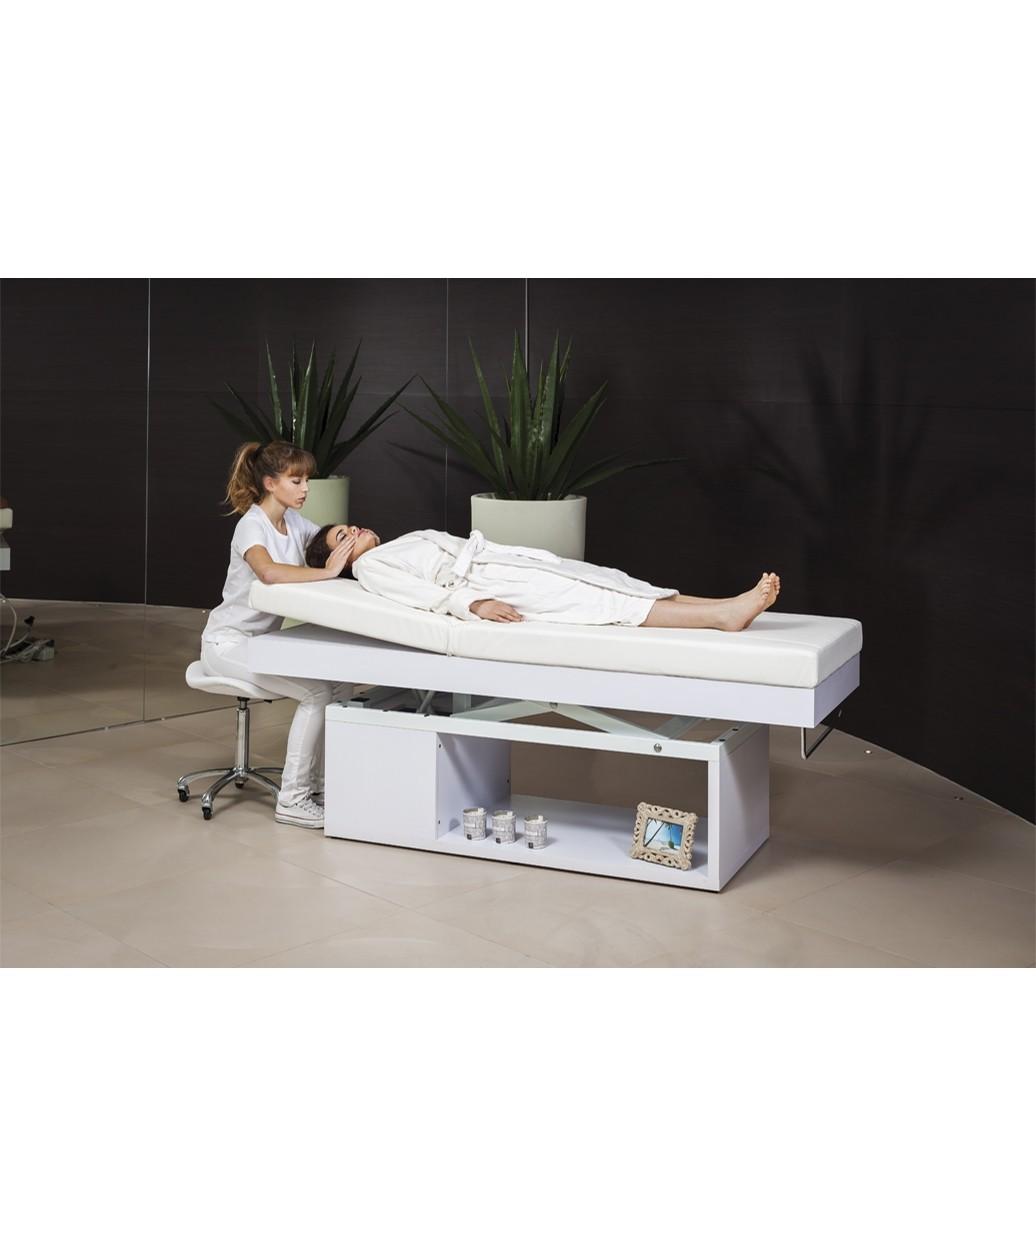 Belvedere Harmony Electric Multi Purpose Bed